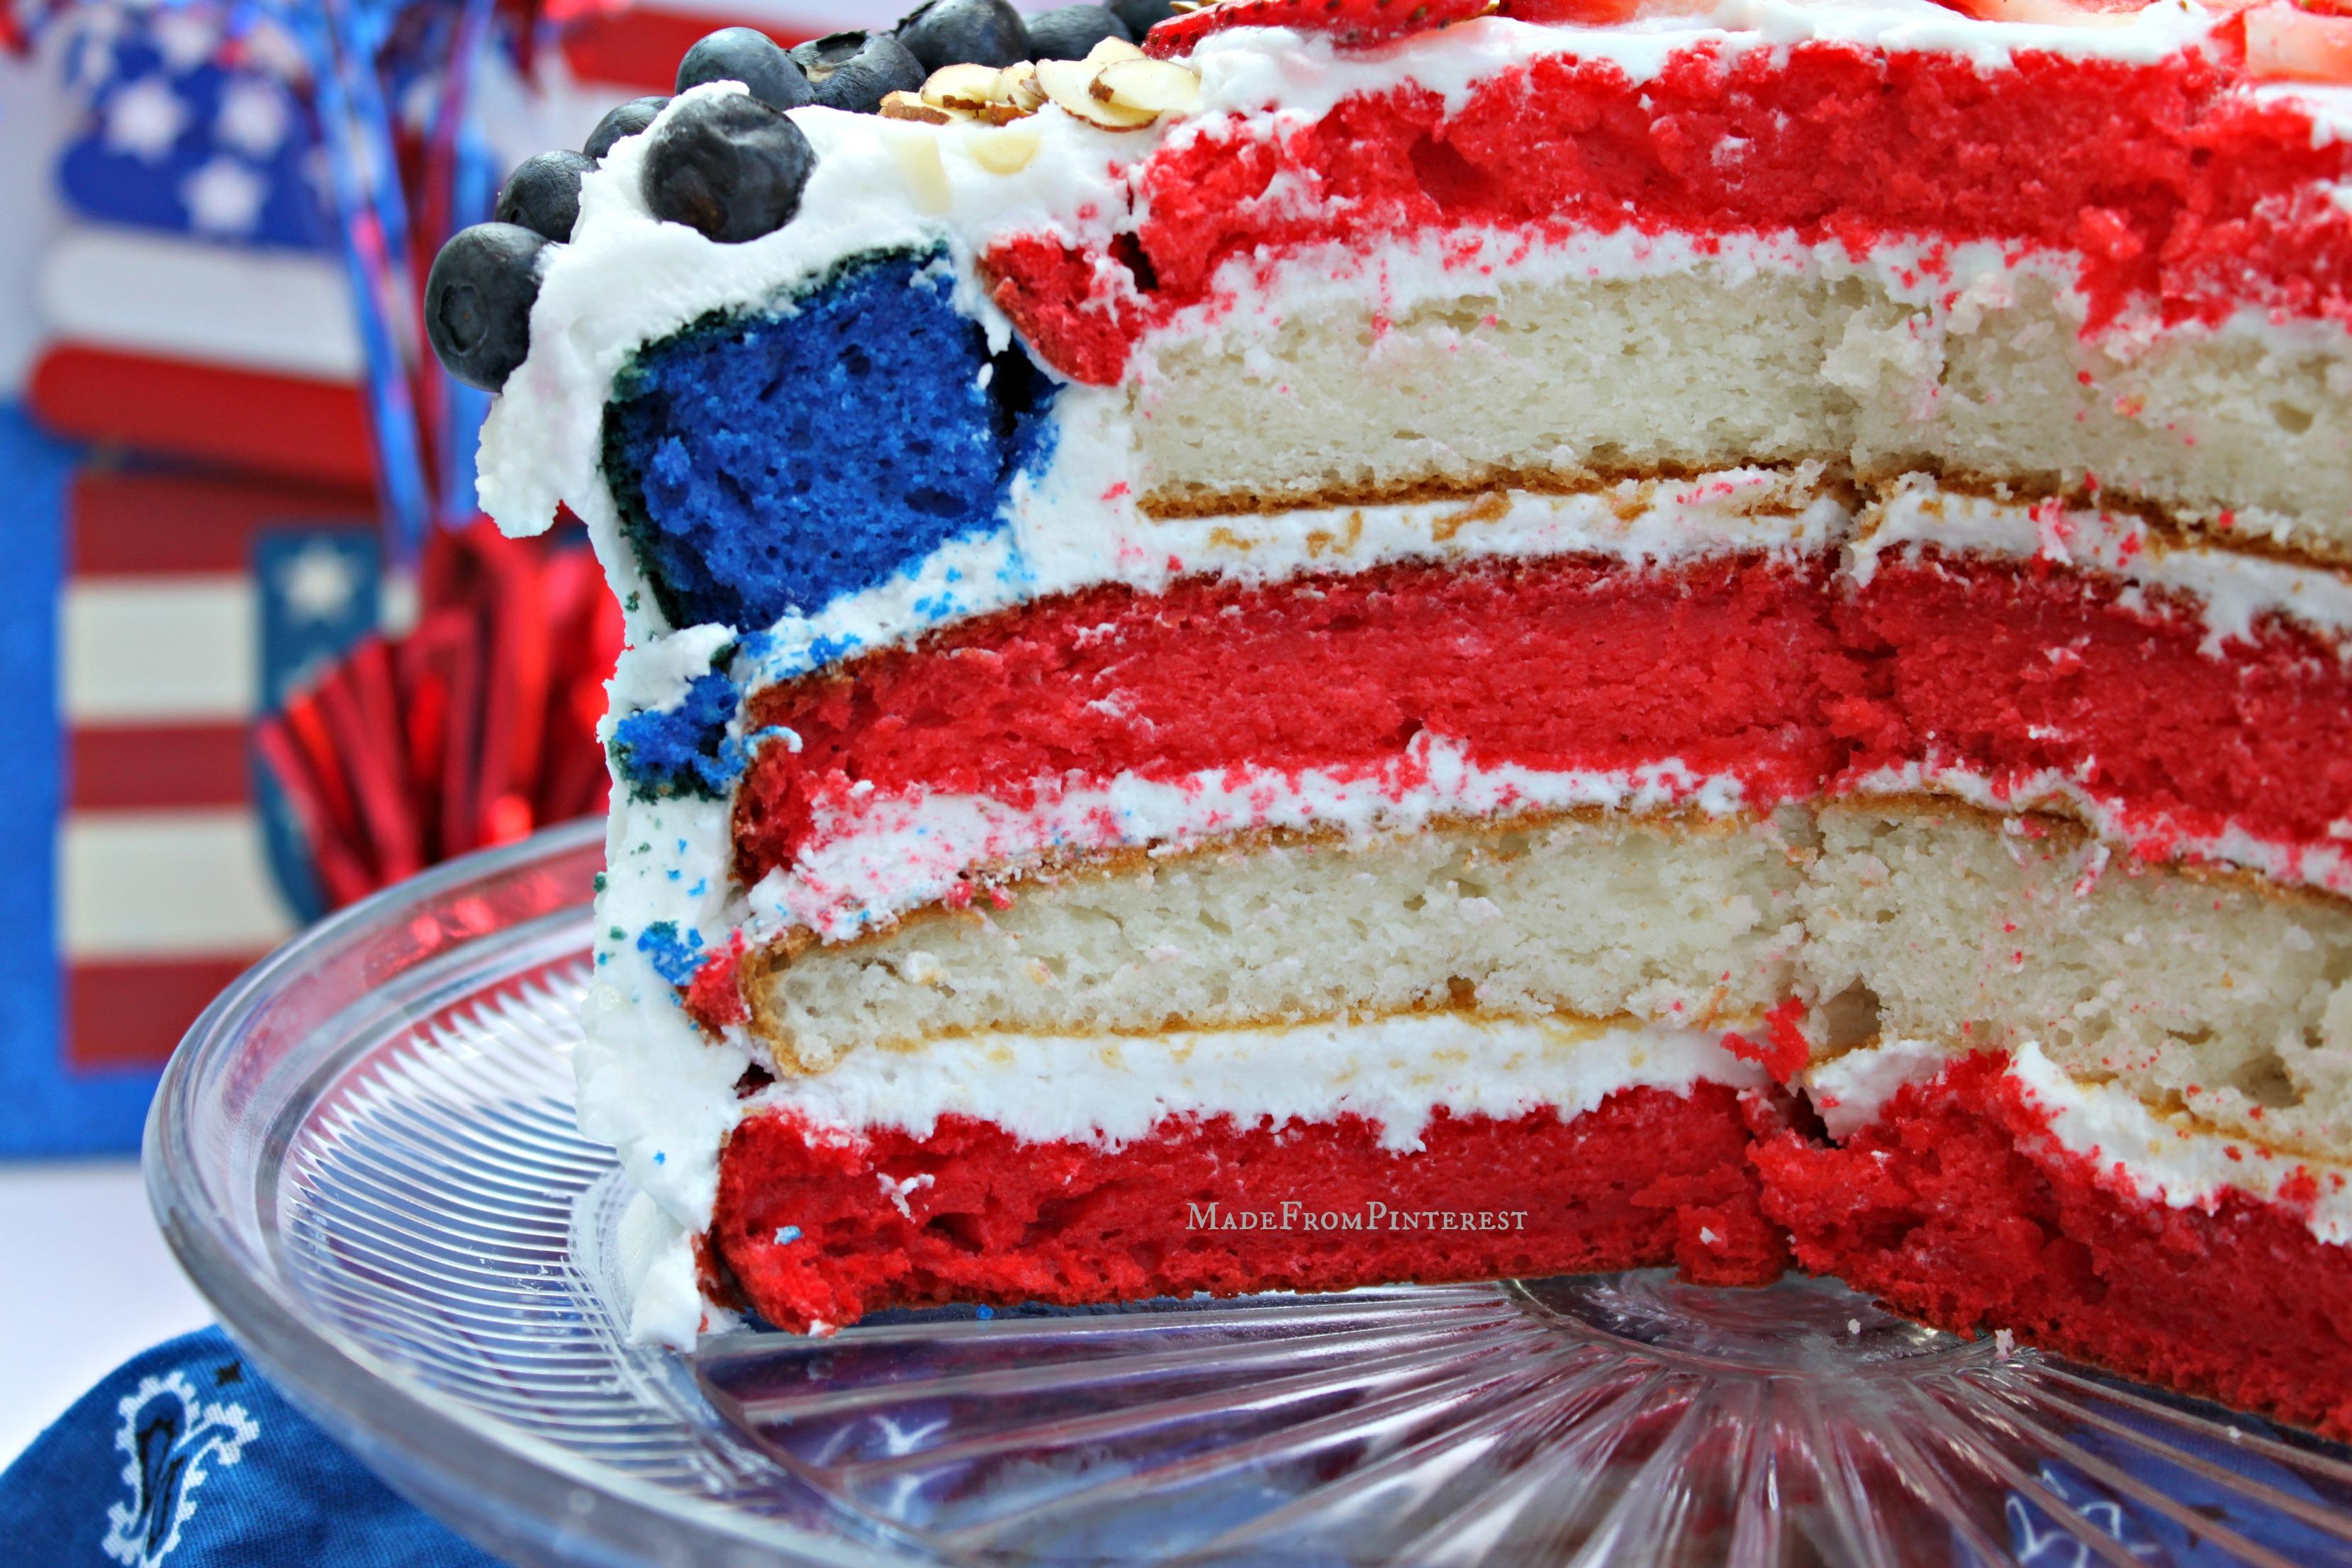 American Flag Cake - TGIF - This Grandma is Fun